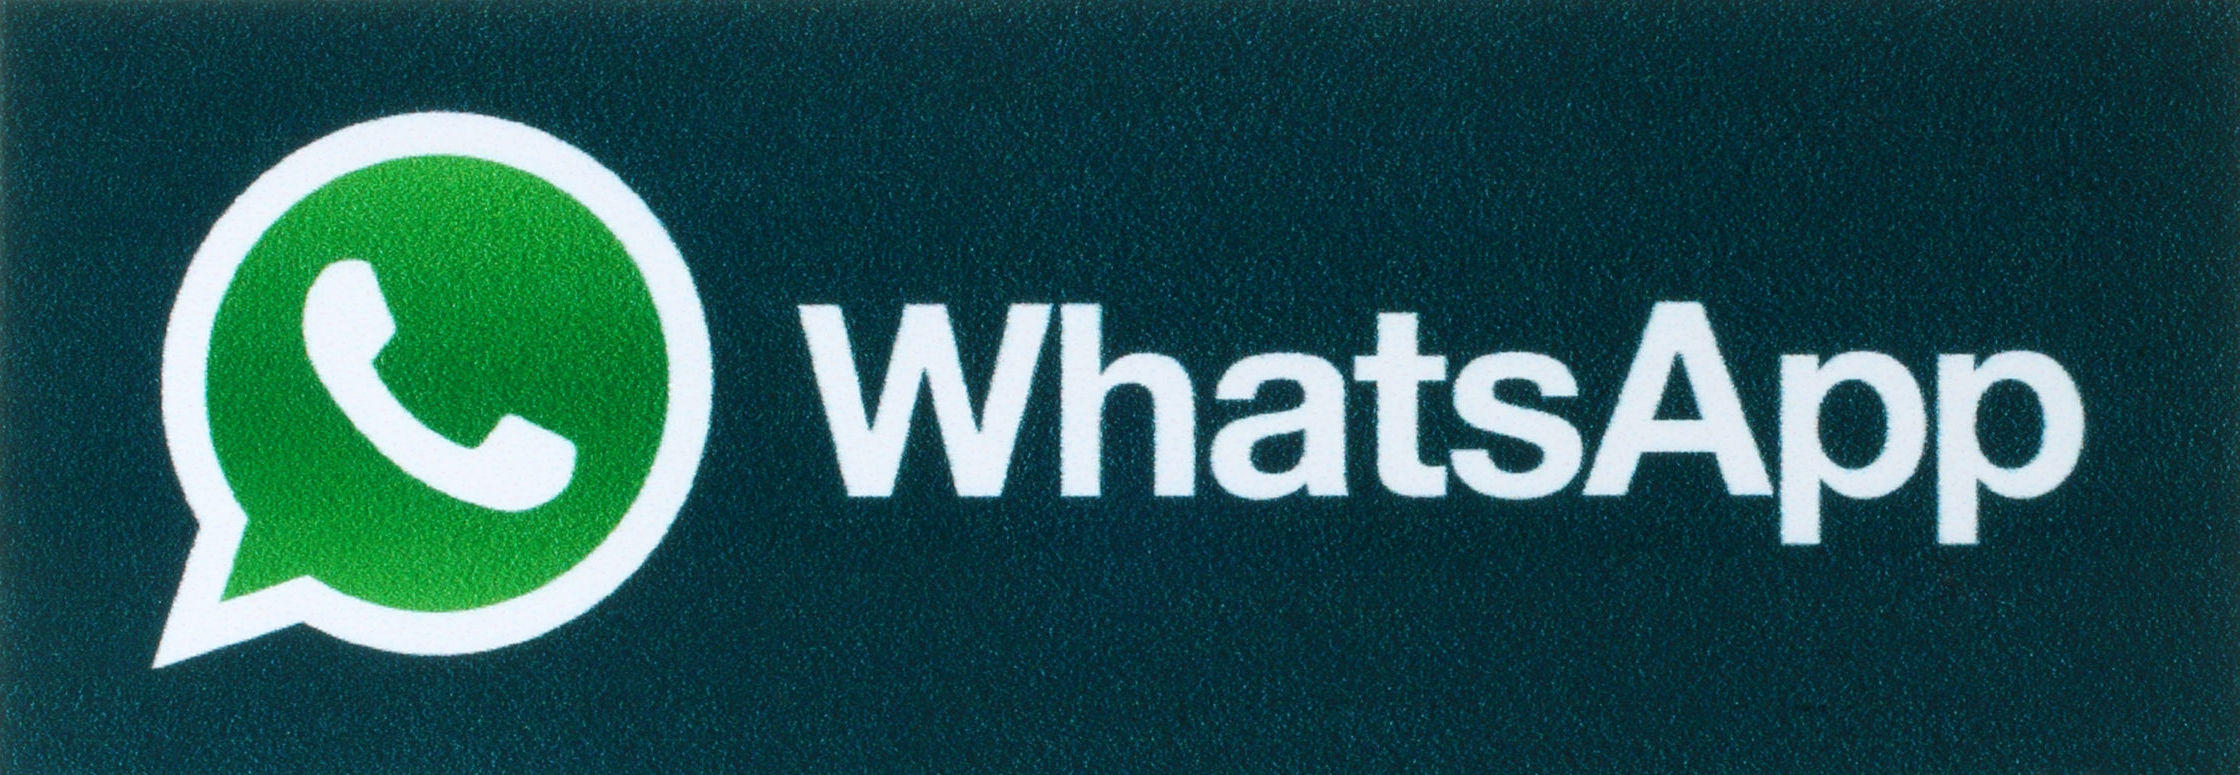 WhatsApp als webcare tool